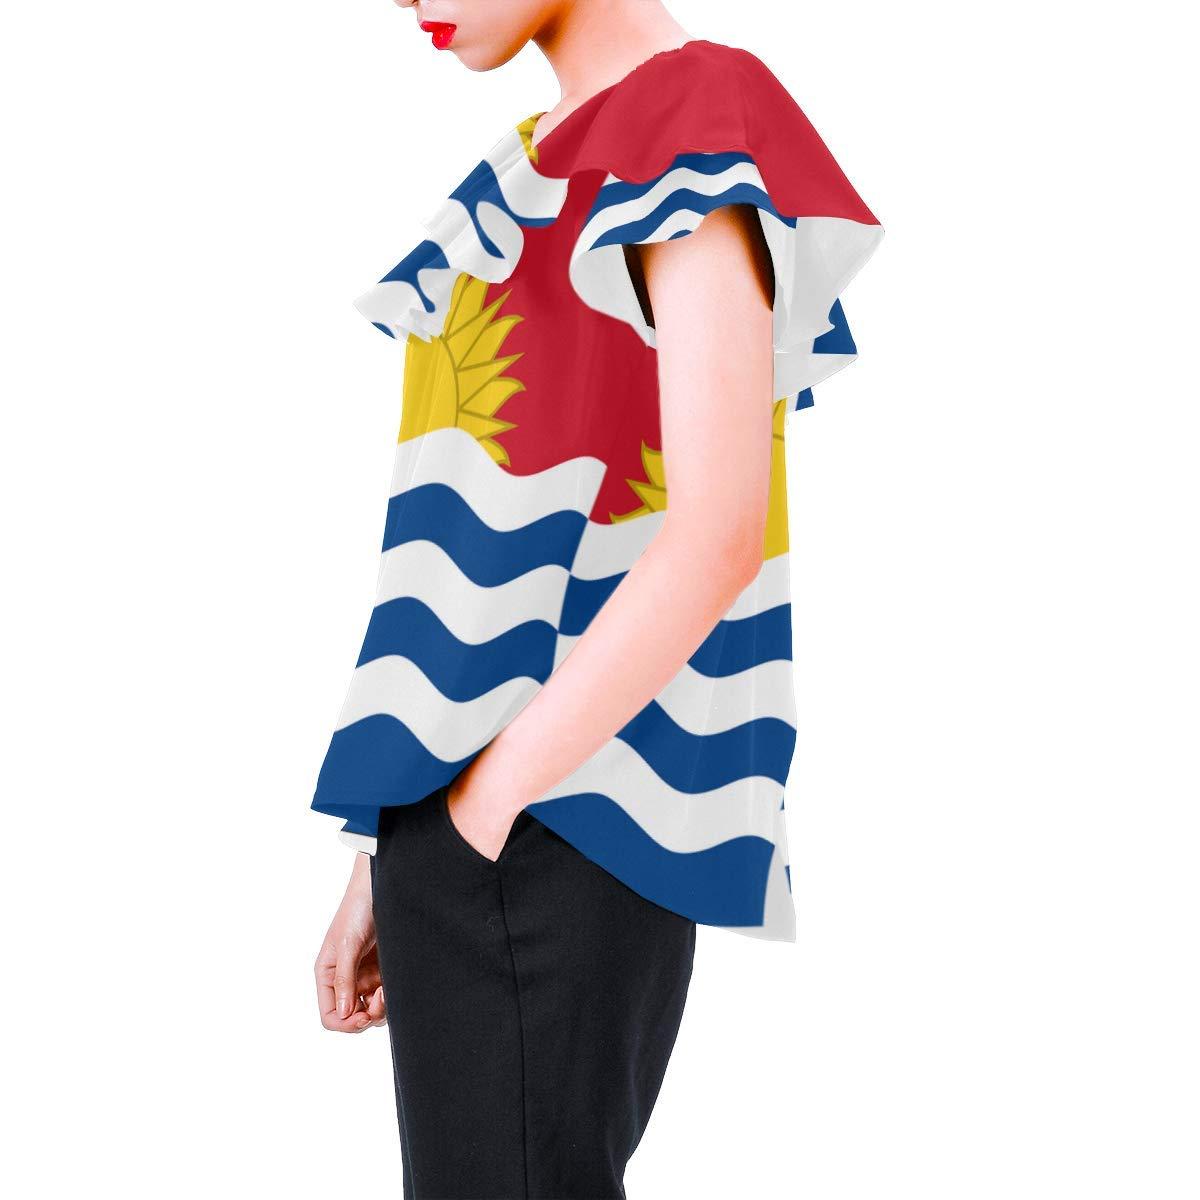 Happy Xmas Christmas Womens A-Line Chiffon Blouse Shirt Tops